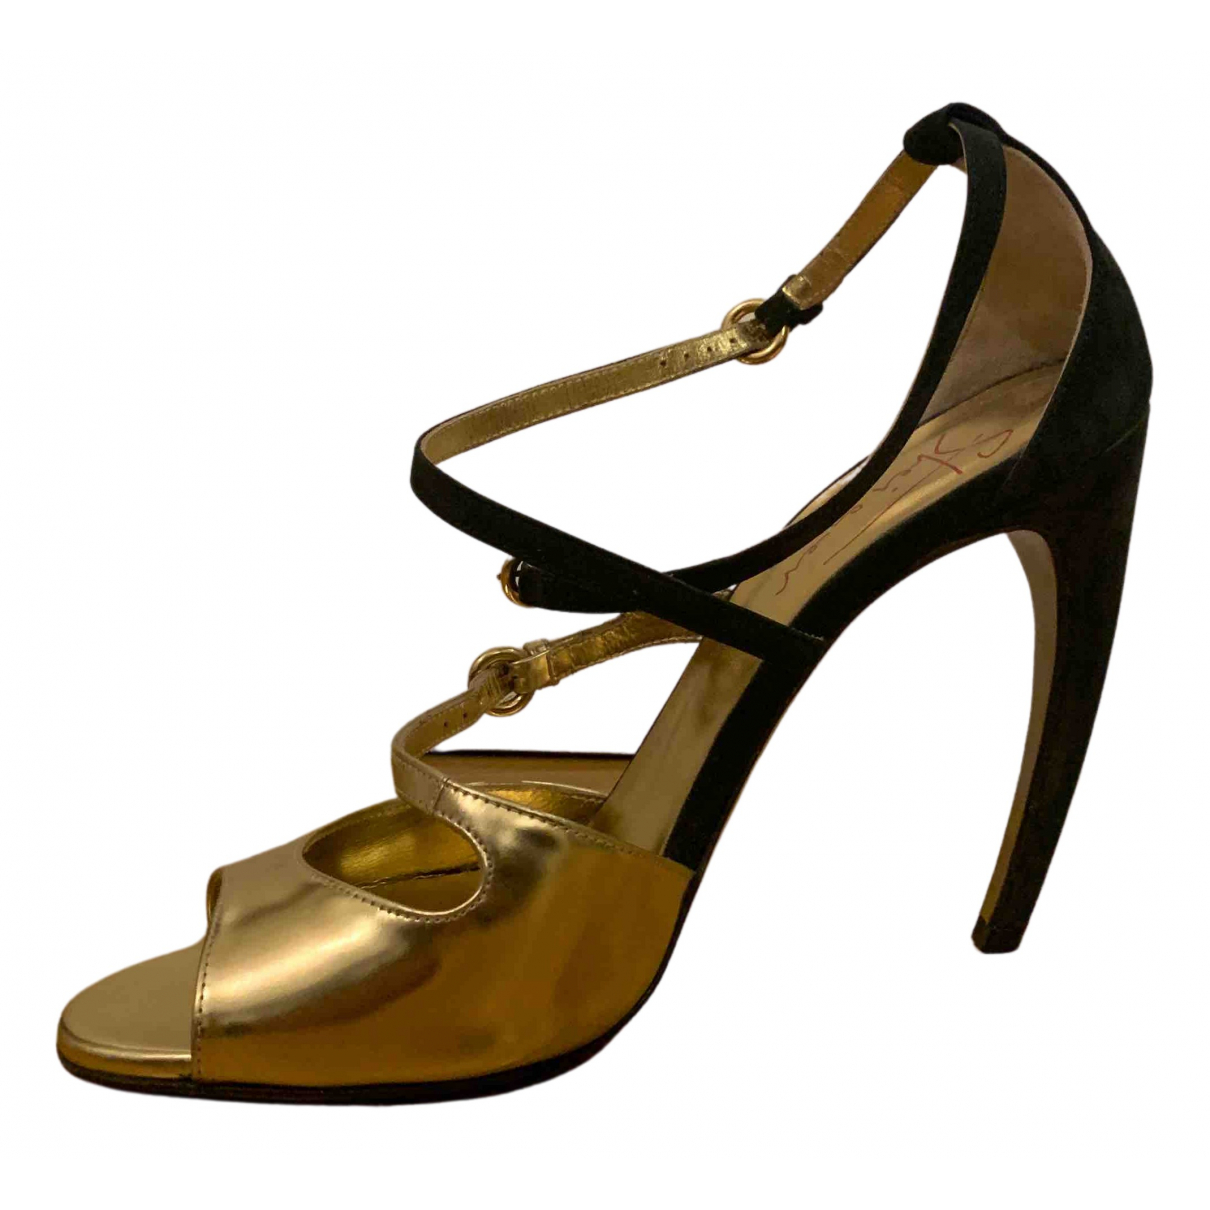 Walter Steiger N Gold Leather Sandals for Women 39 EU